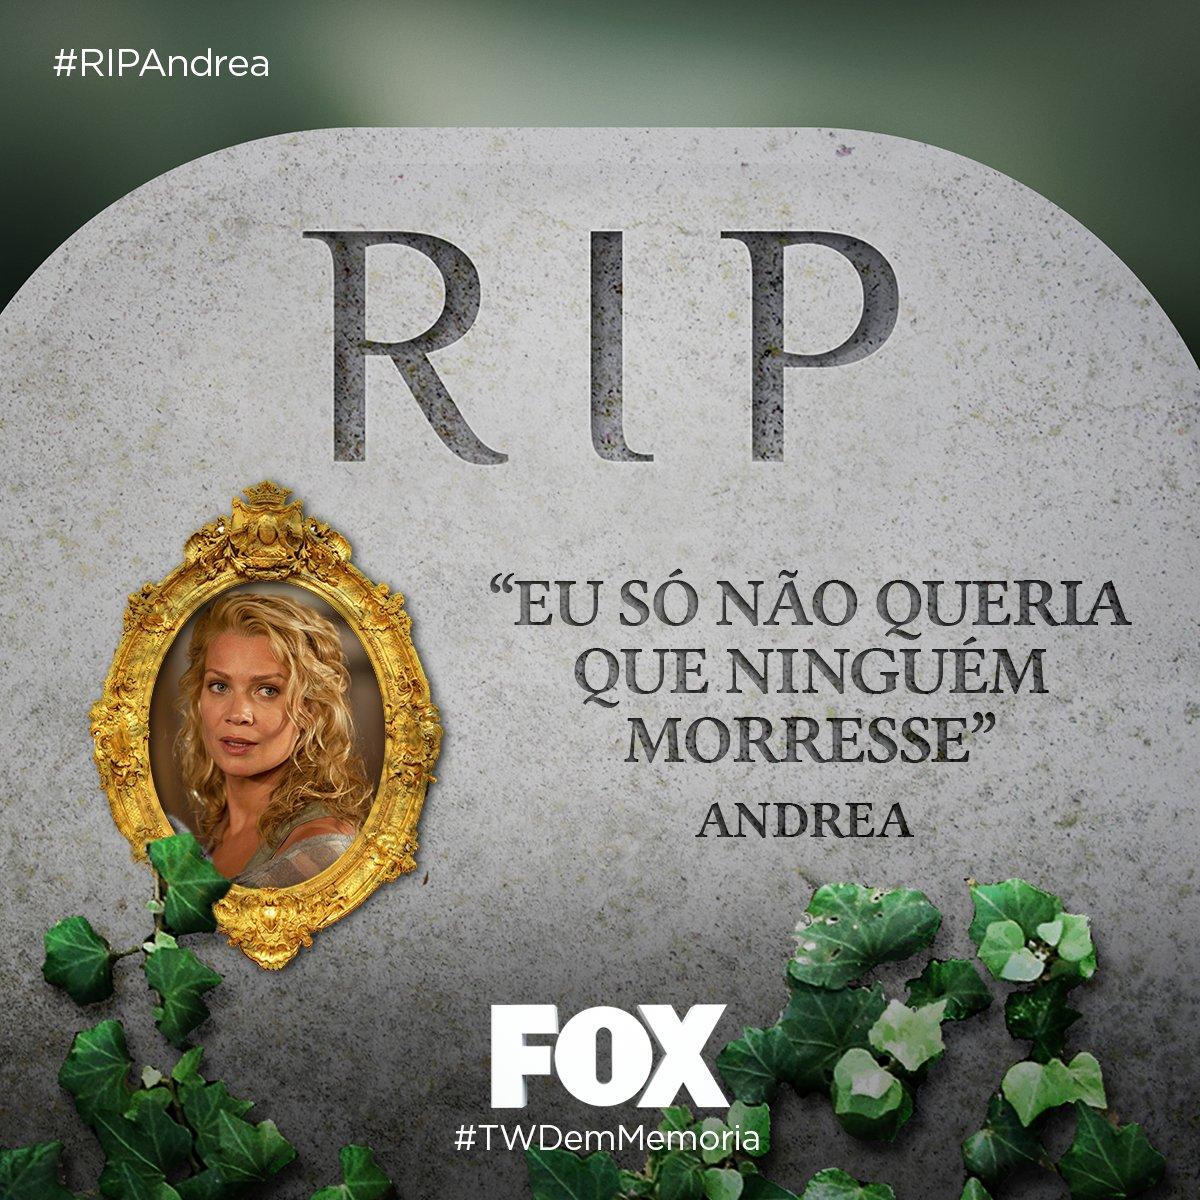 #RIPAndrea: RIP Andrea